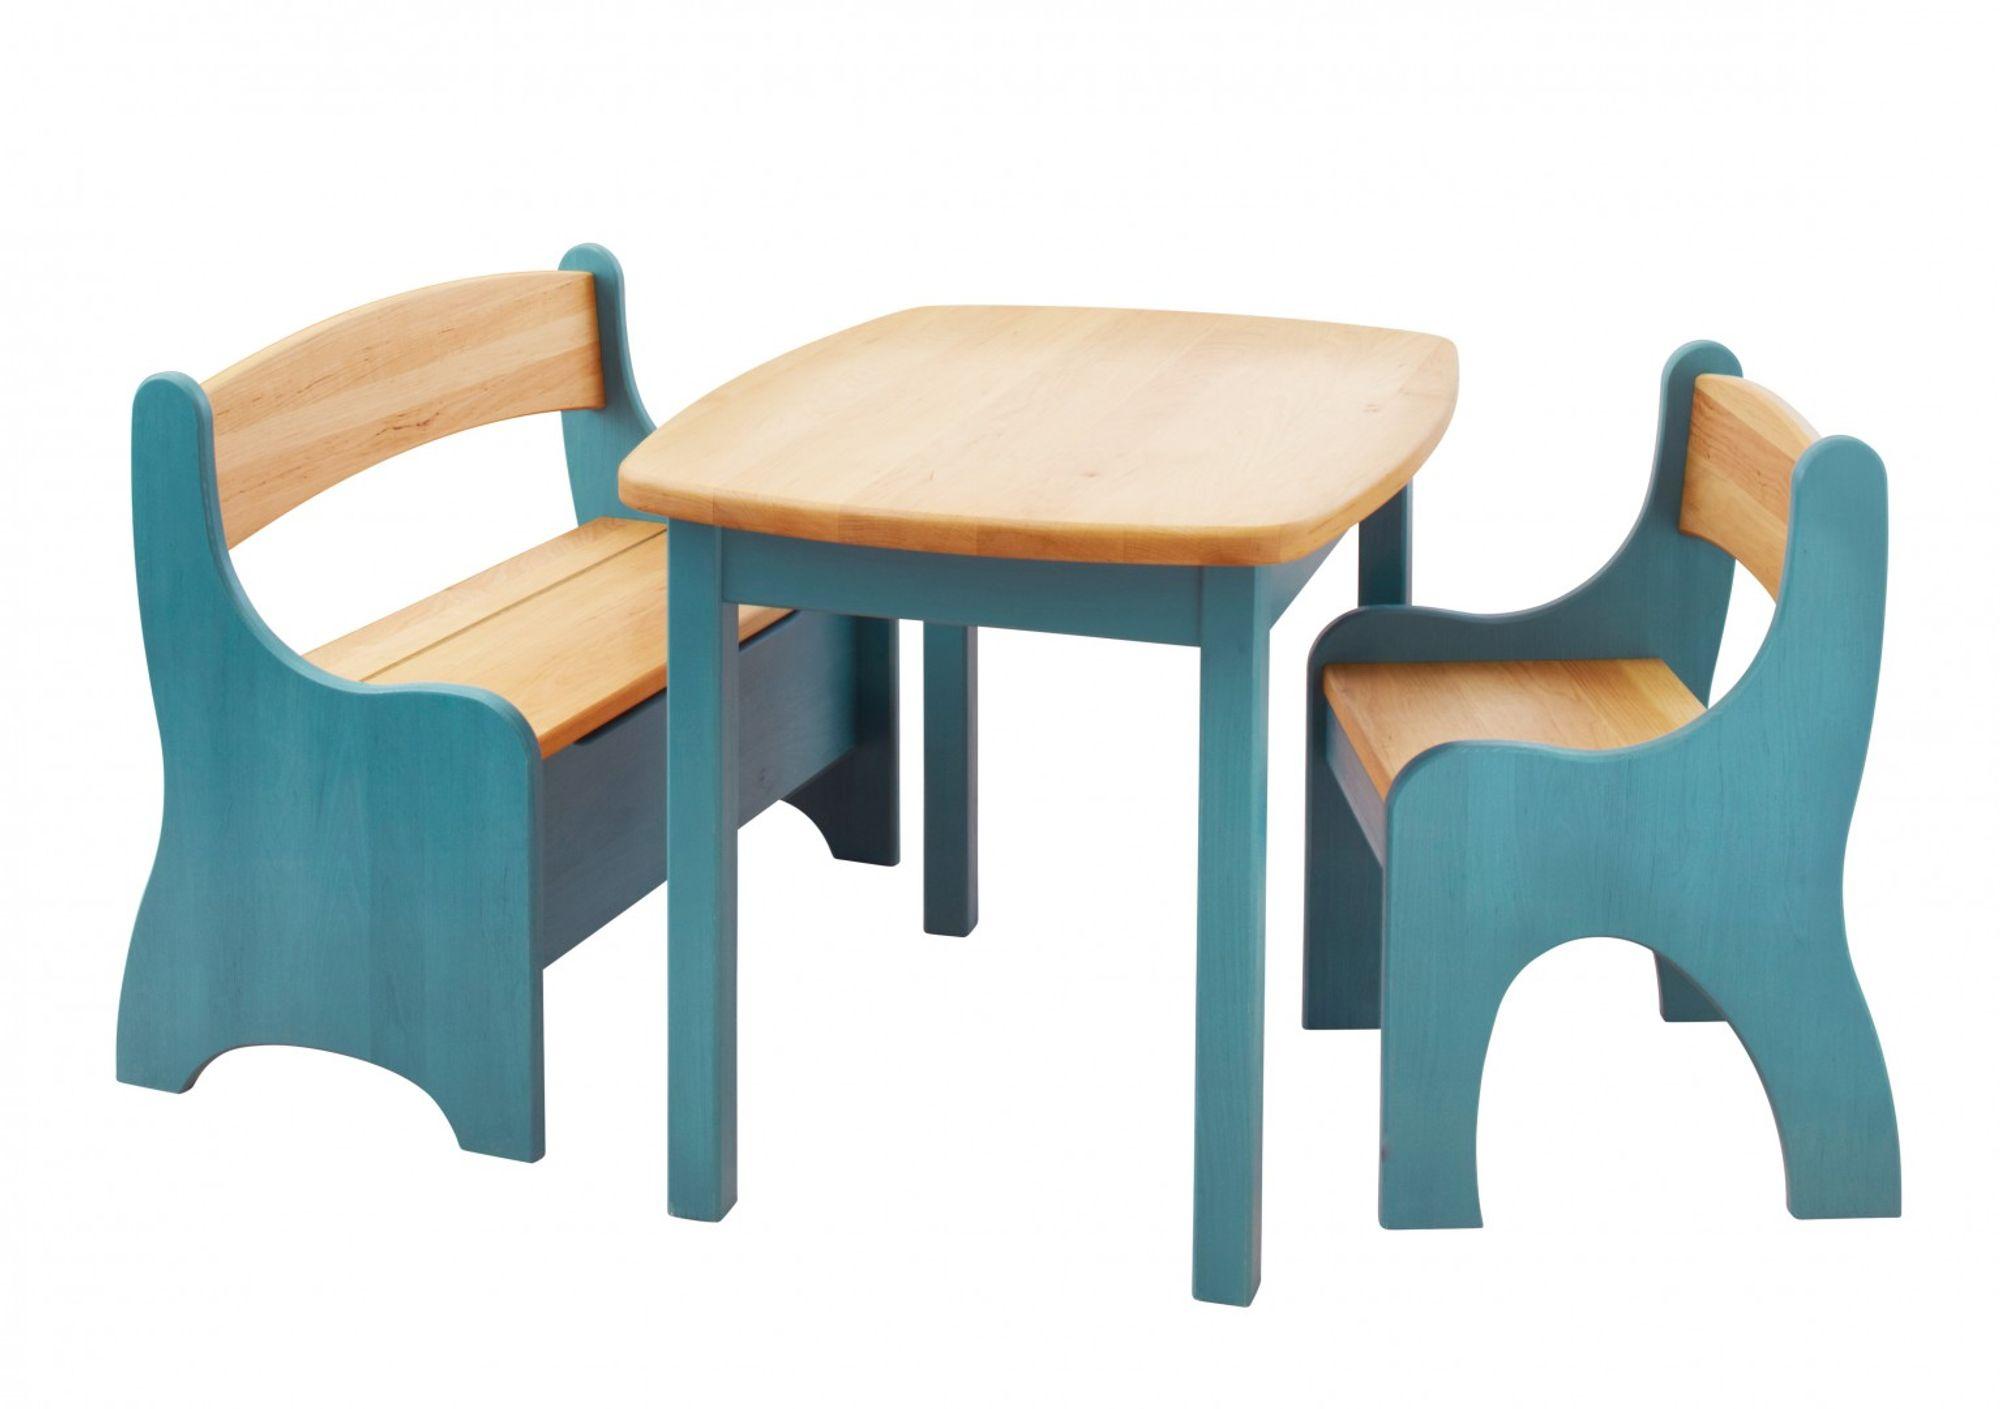 Spar Set Levin Kindersitzgruppe Komplett Tisch Bank Stuhl